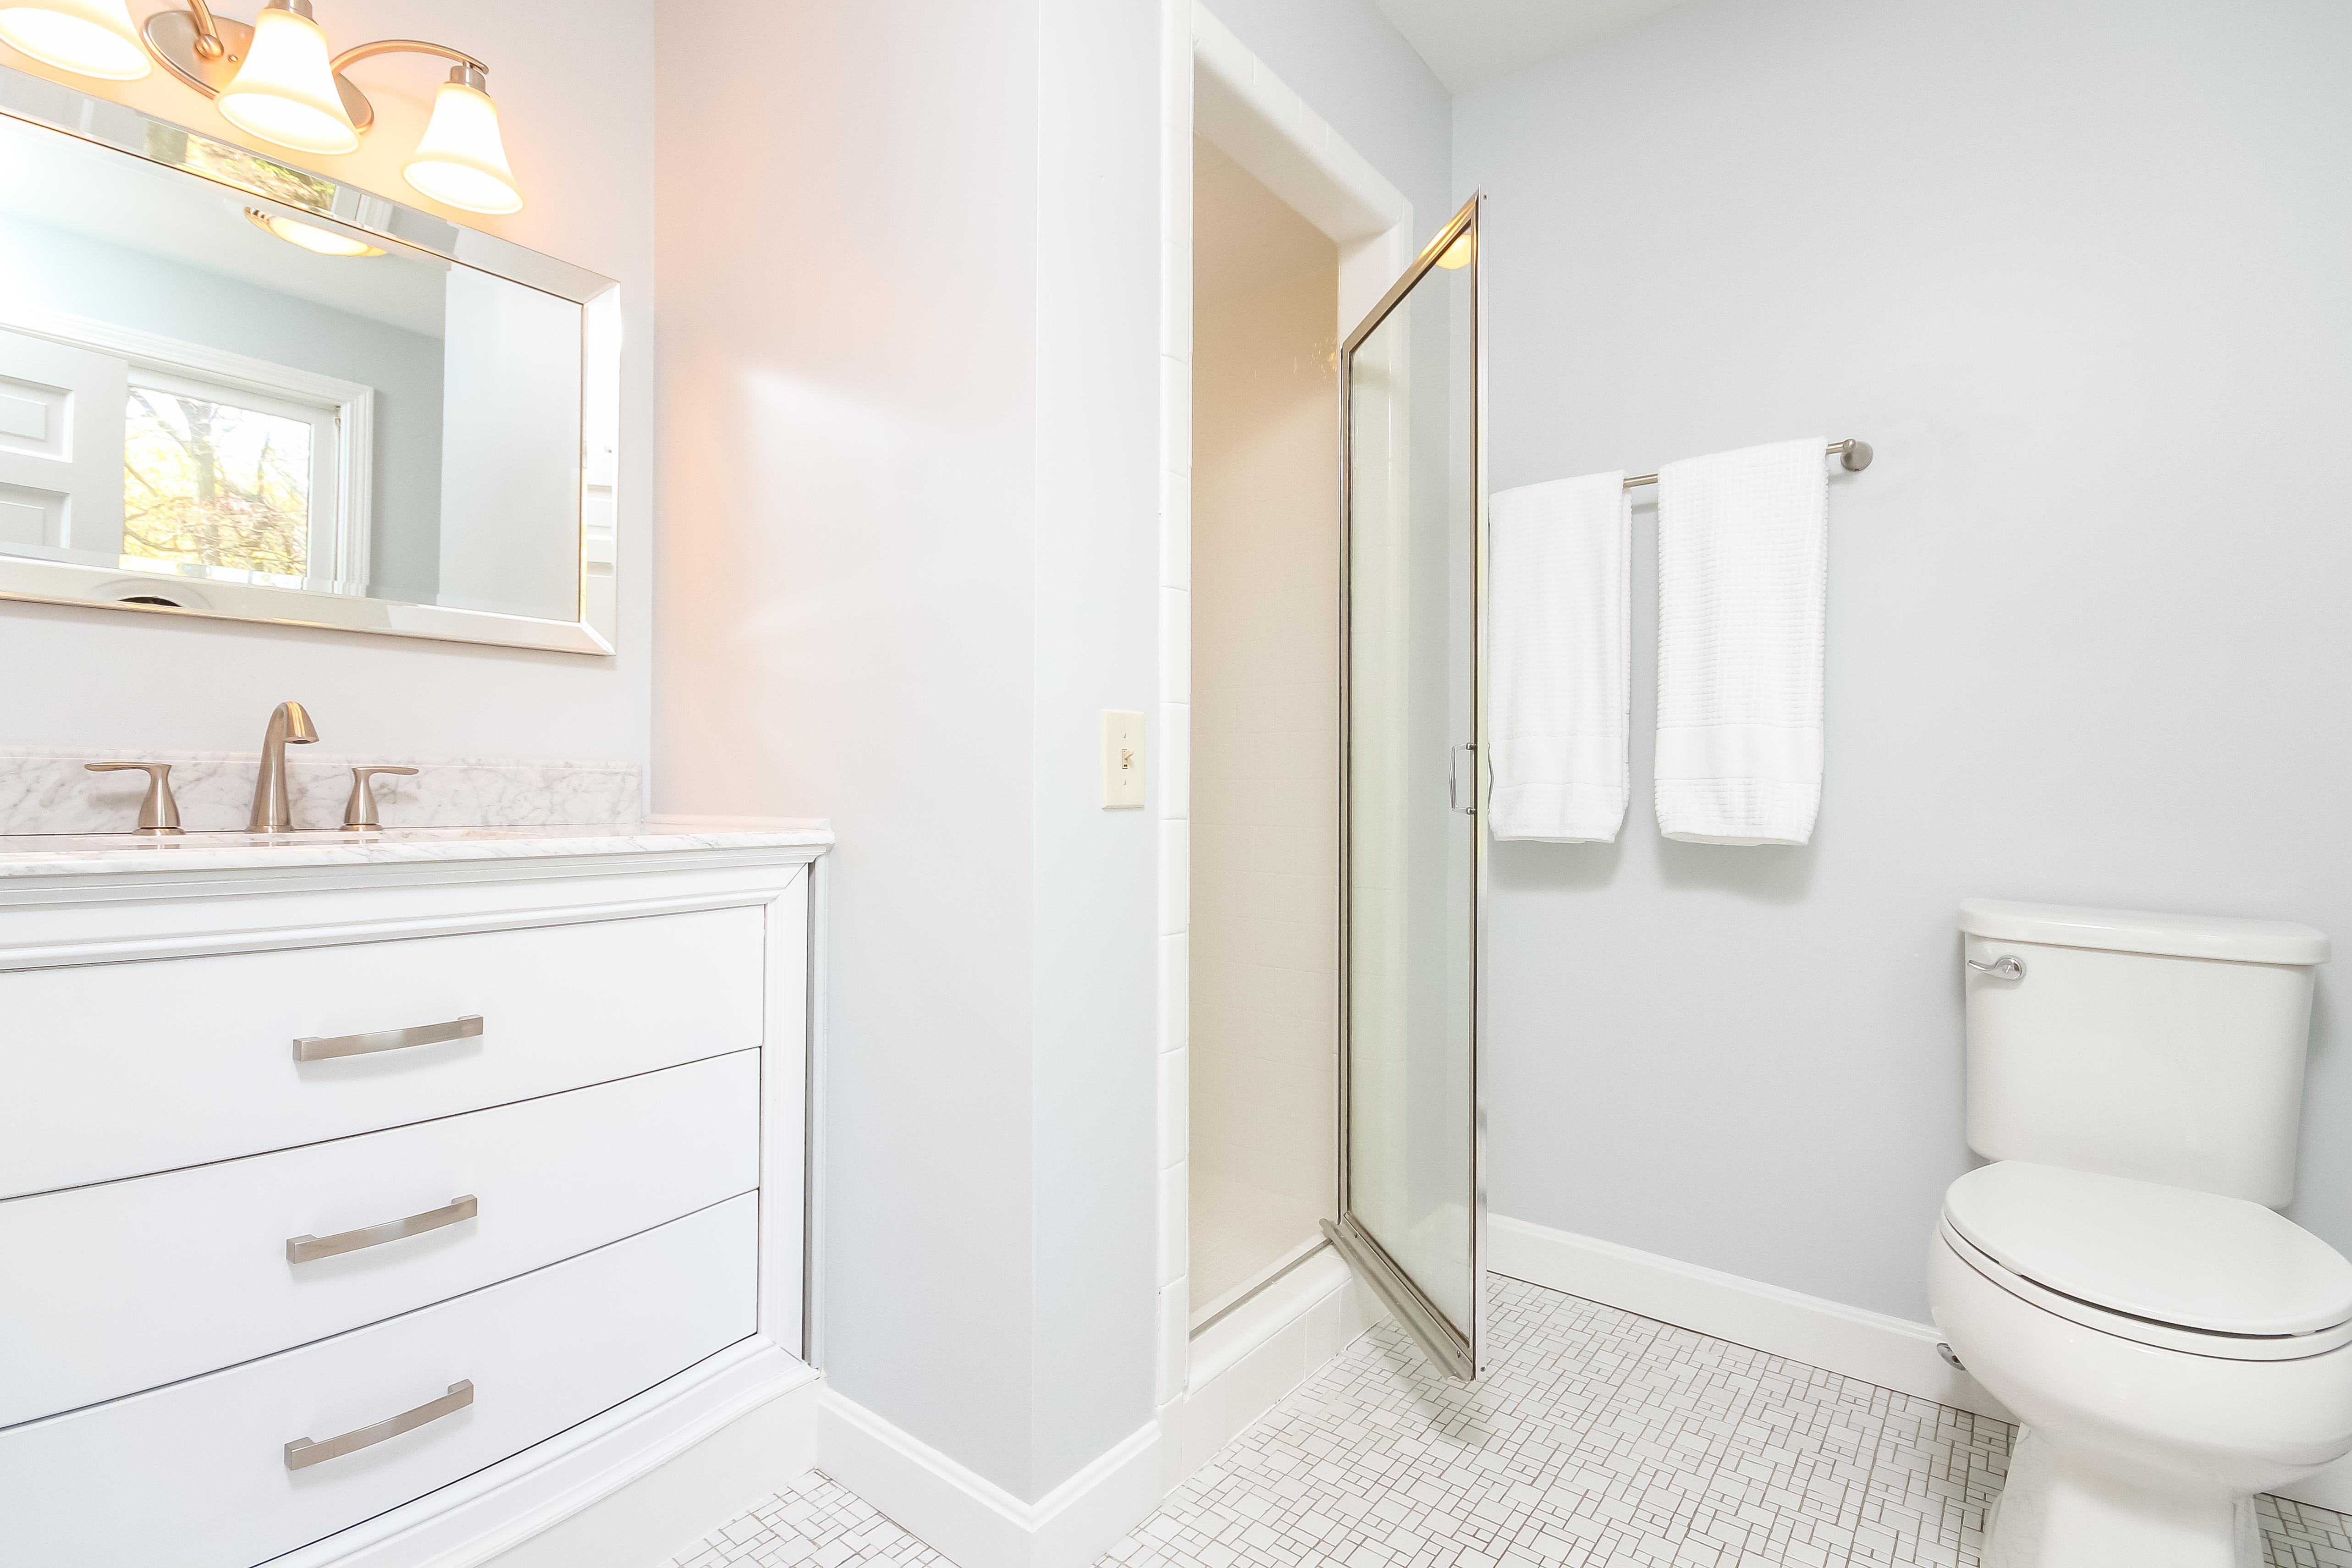 Bathroom suites warwick - 49 Heritage Dr Heritage Park Warwick Ri 02818